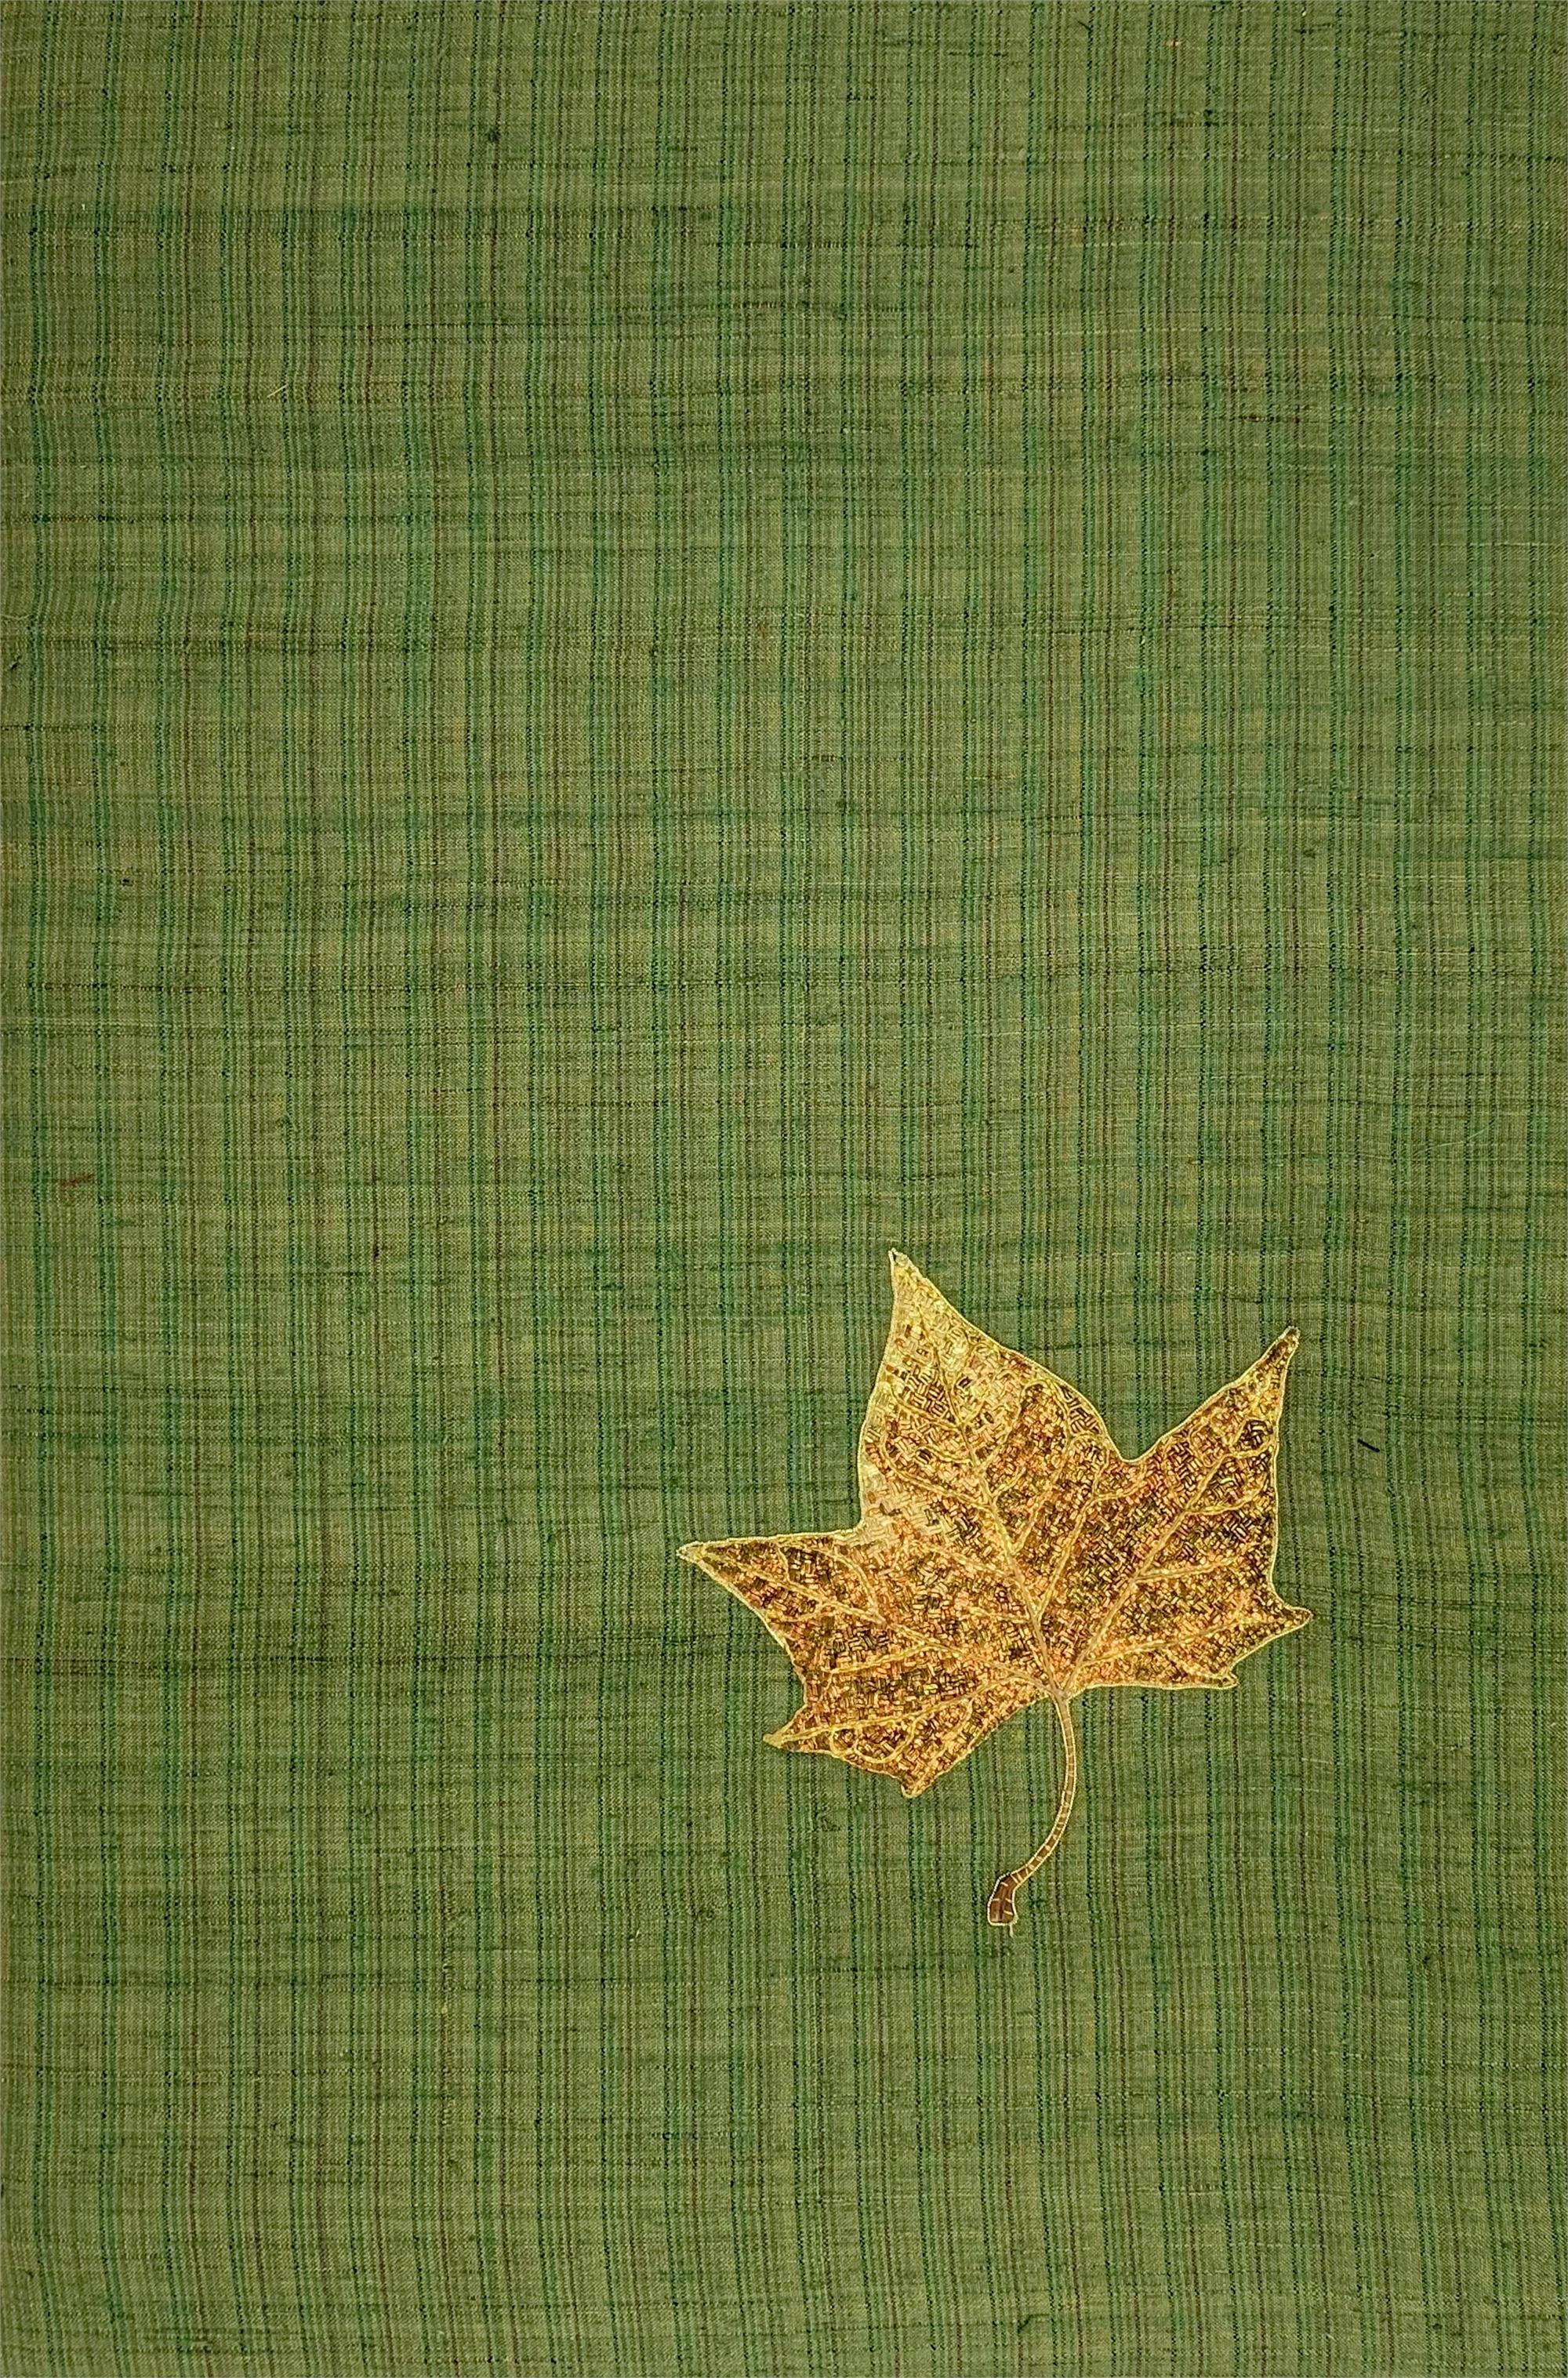 Autumn I: Planetree Leaf by Tiao Nithakhong Somsanith